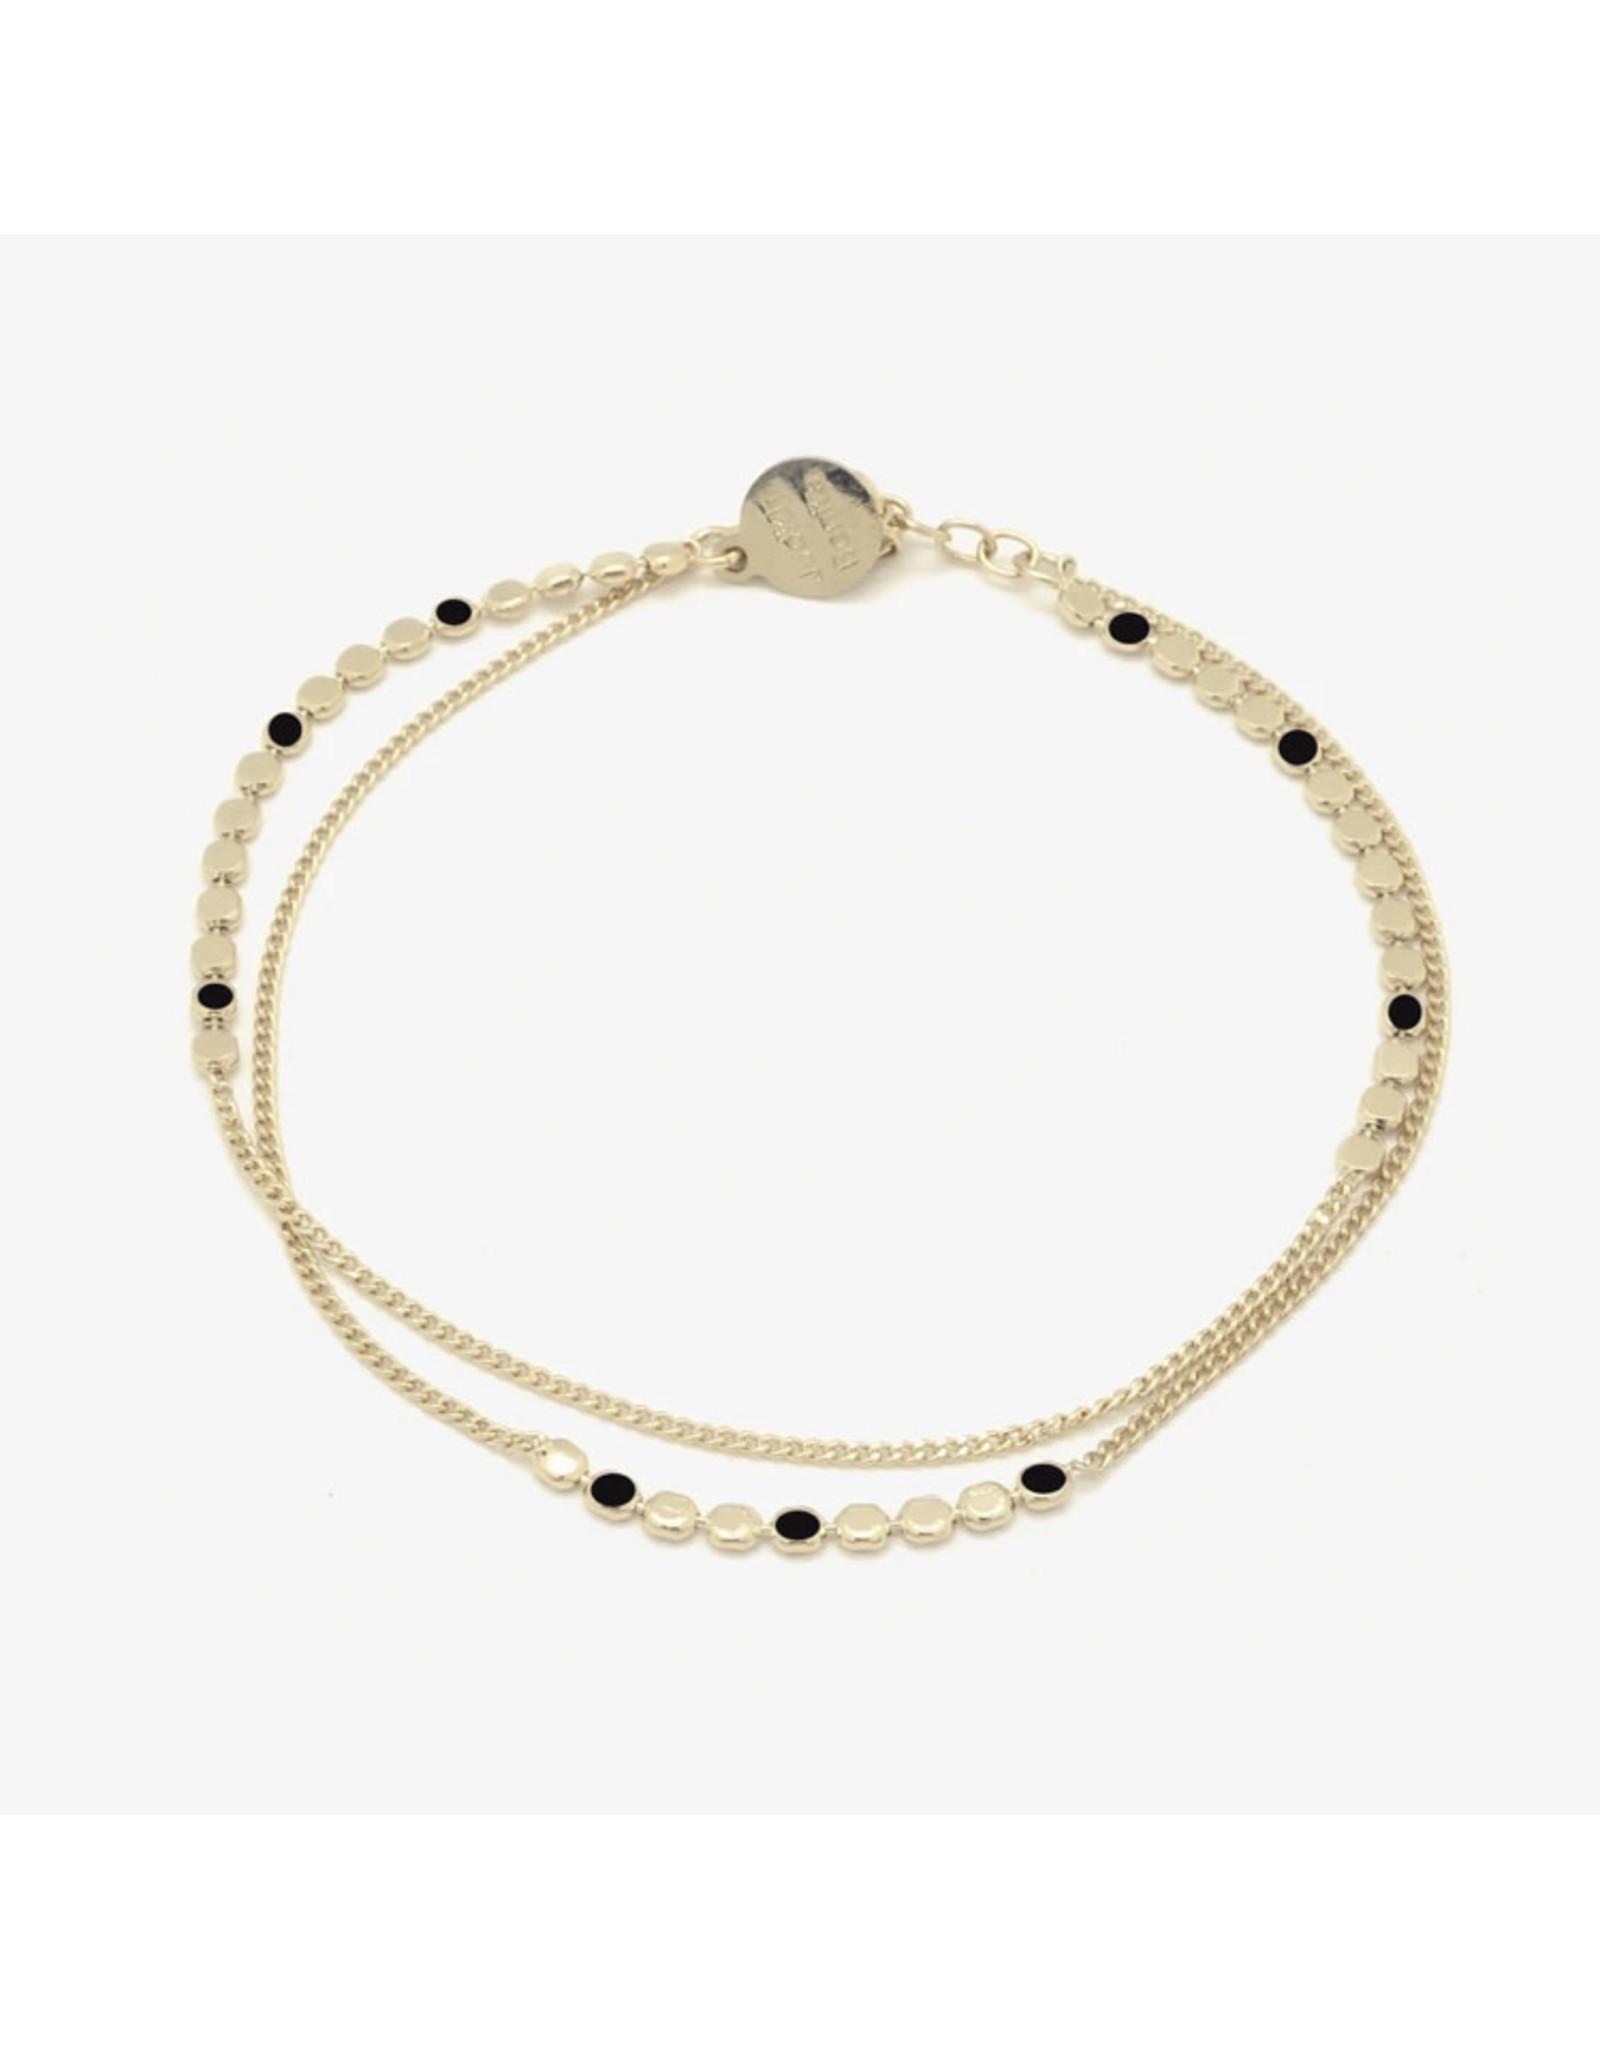 Judith Benita Armband Molto Multi - Zwart - Messing Verguld - Lengte 15,5cm